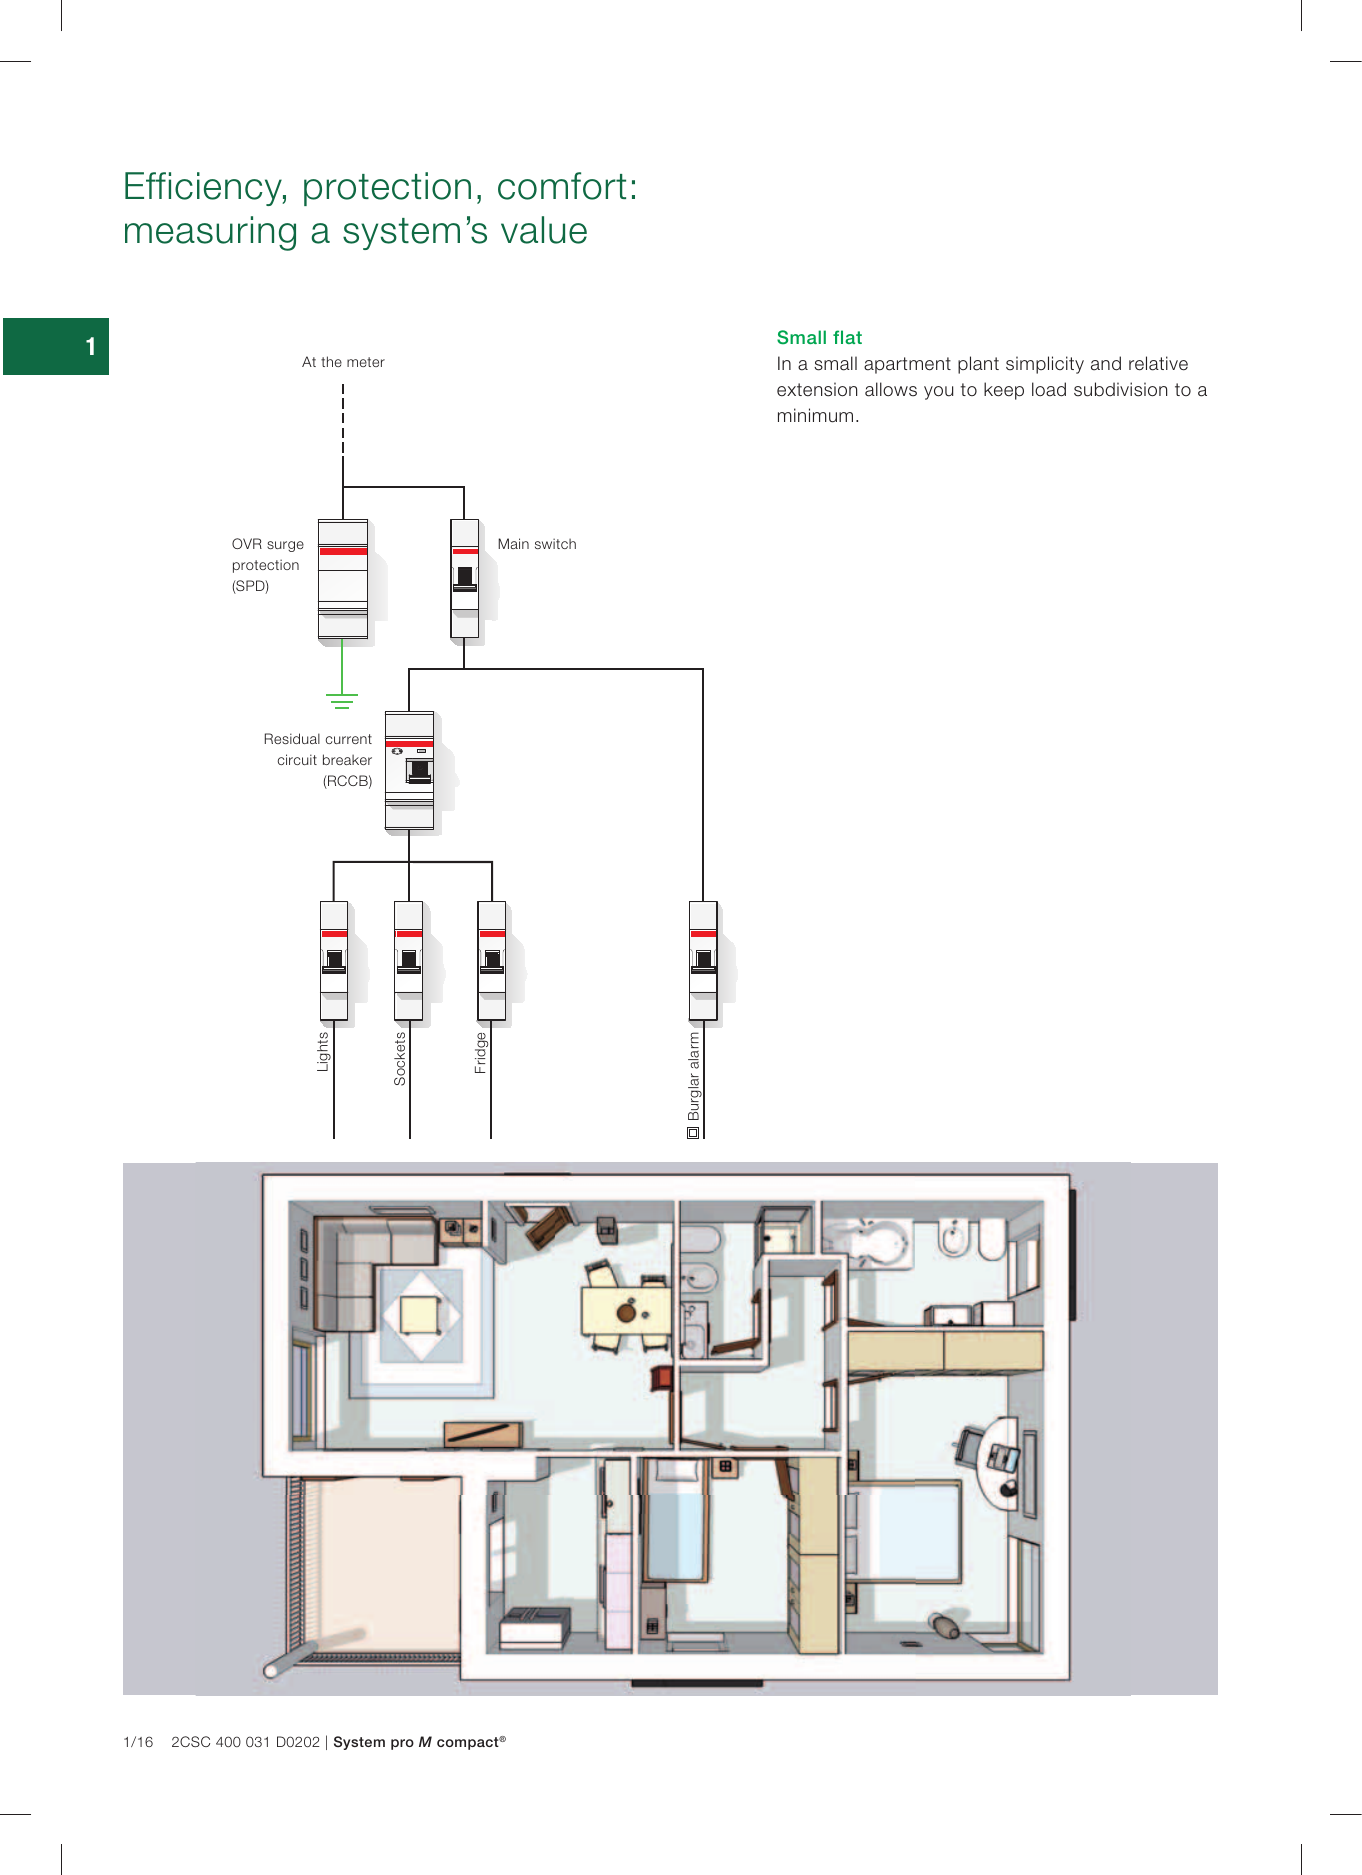 Wiring Diagram For Rccb